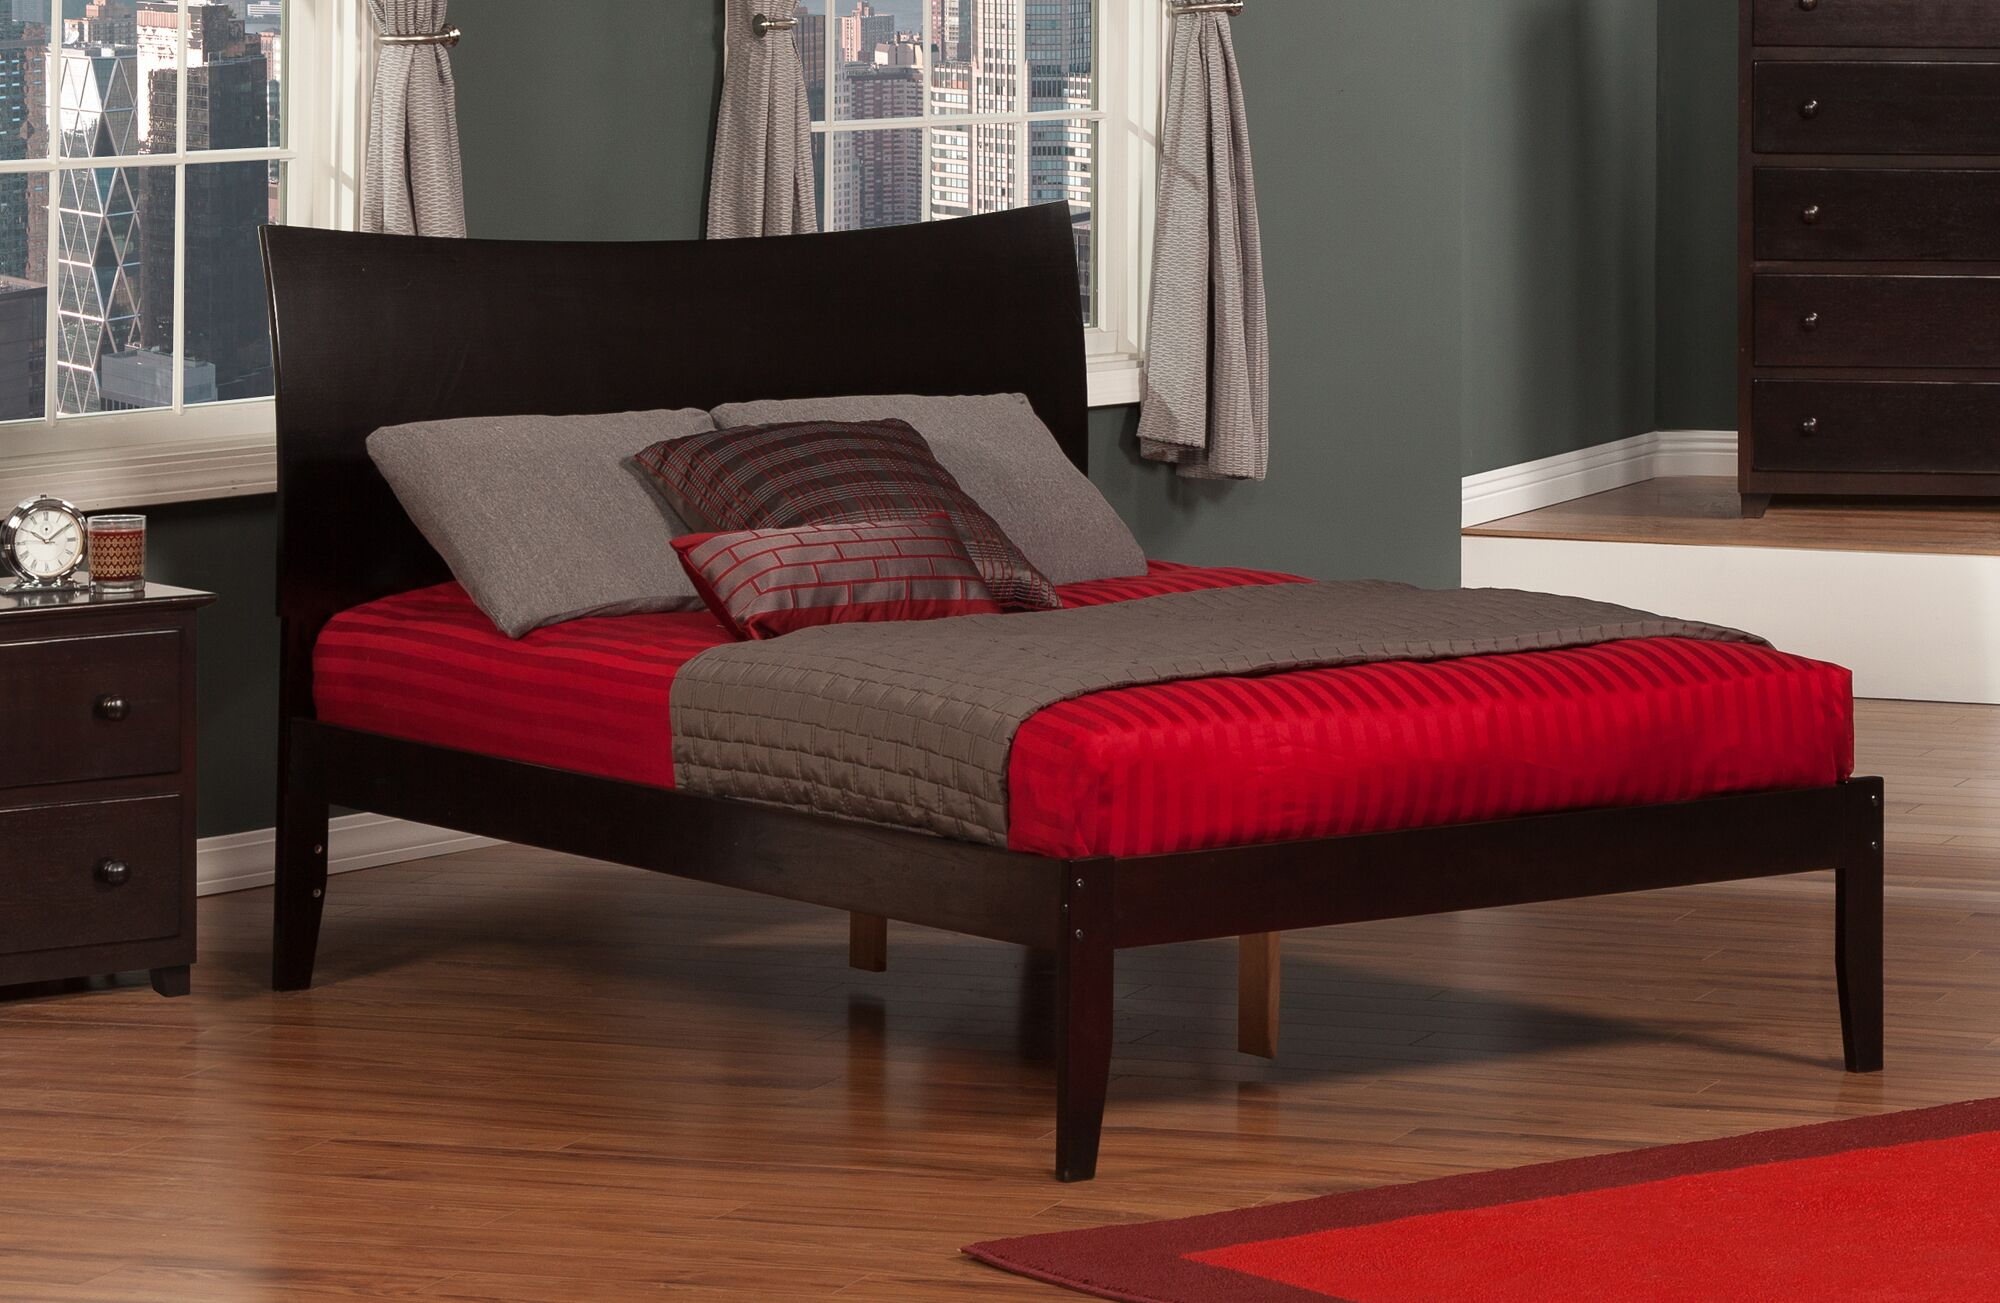 Wrington Platform Bed Color: Espresso, Size: Twin